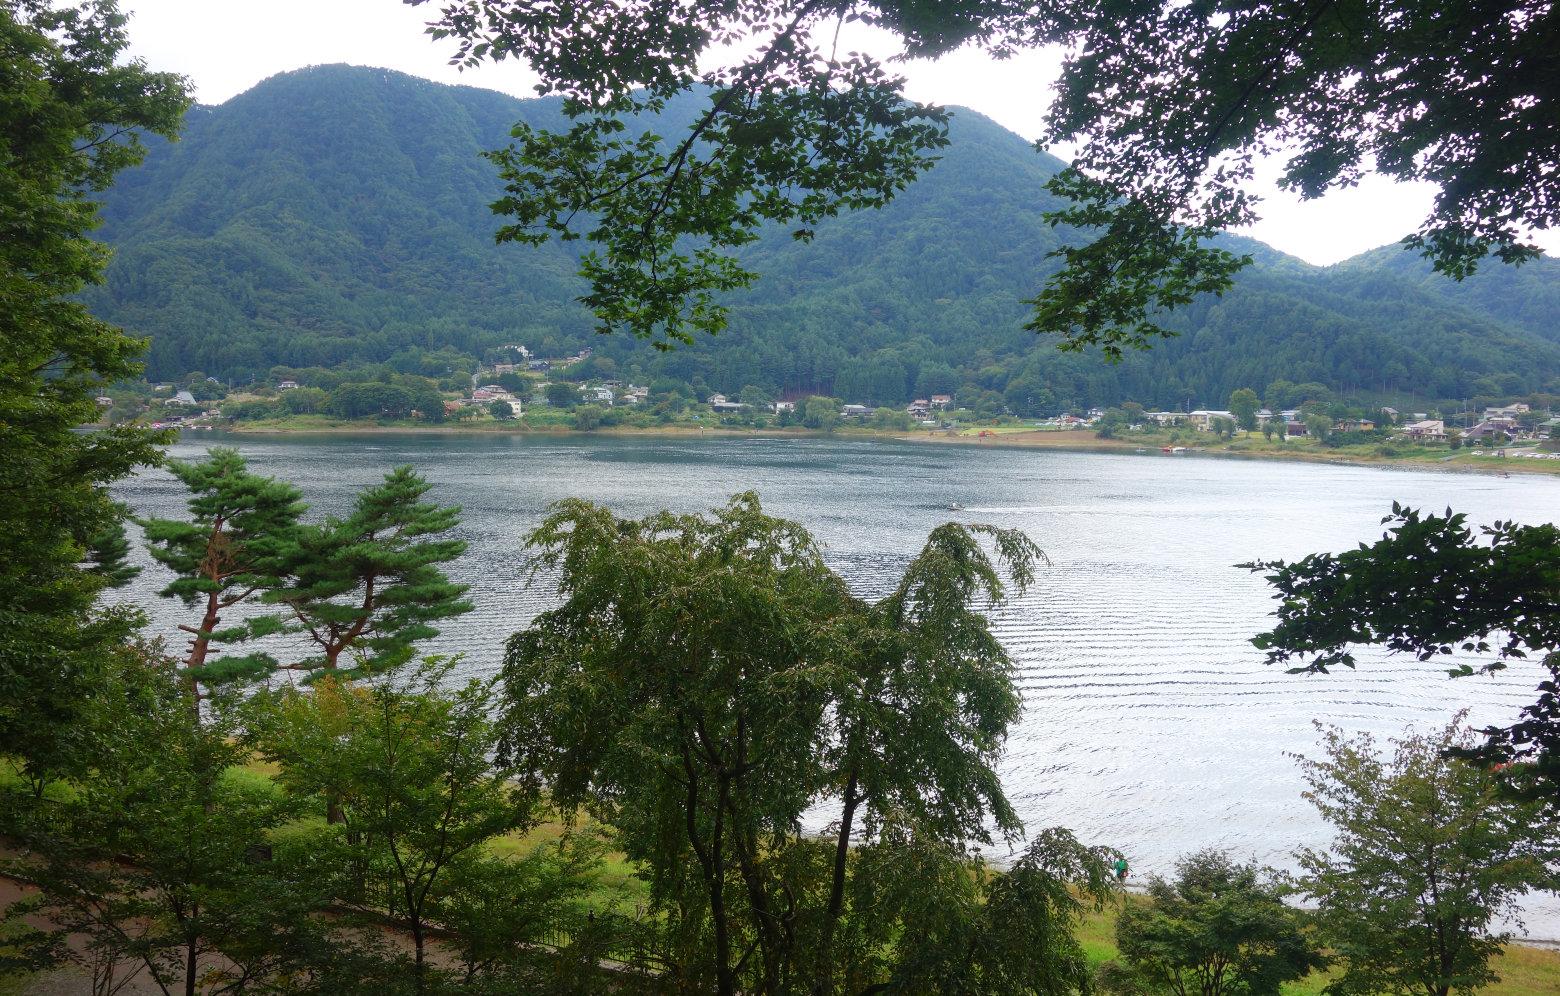 Mt Fuji Fahrradtour Kawaguchiko See